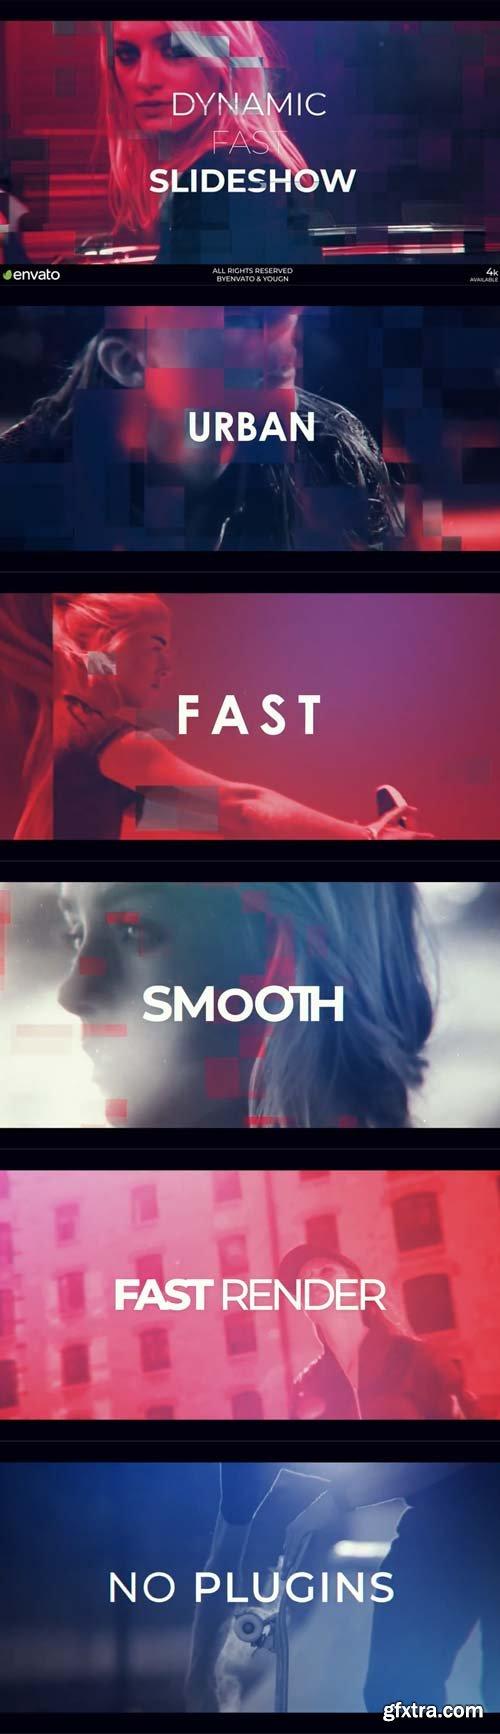 Videohive - Dynamic Fast Slideshow - 22035121